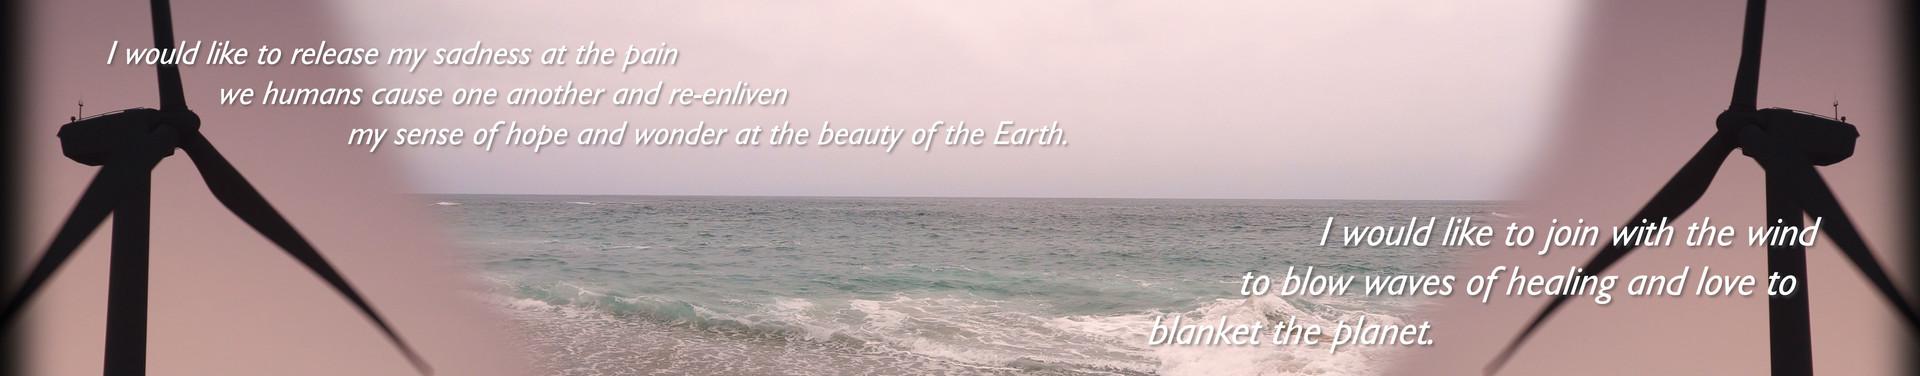 Waves of Healing